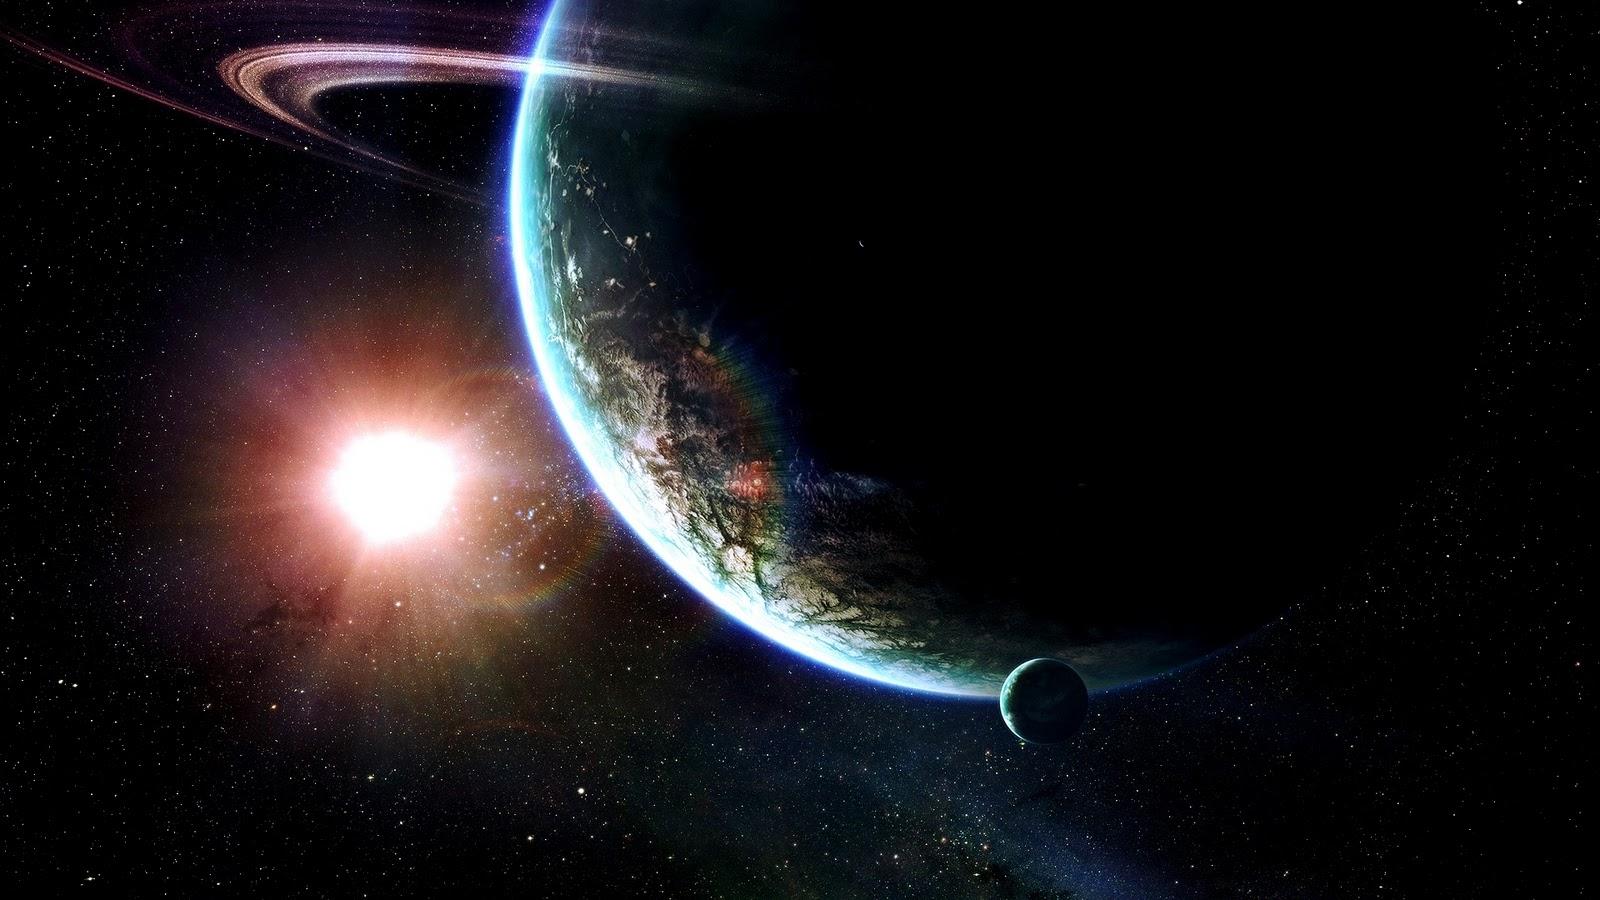 http://1.bp.blogspot.com/-hpcUVA-Y-8k/TpVR3tn0urI/AAAAAAAAC-s/-bwCr5gp2kU/s1600/planet_picture_wallpaper_11.jpg